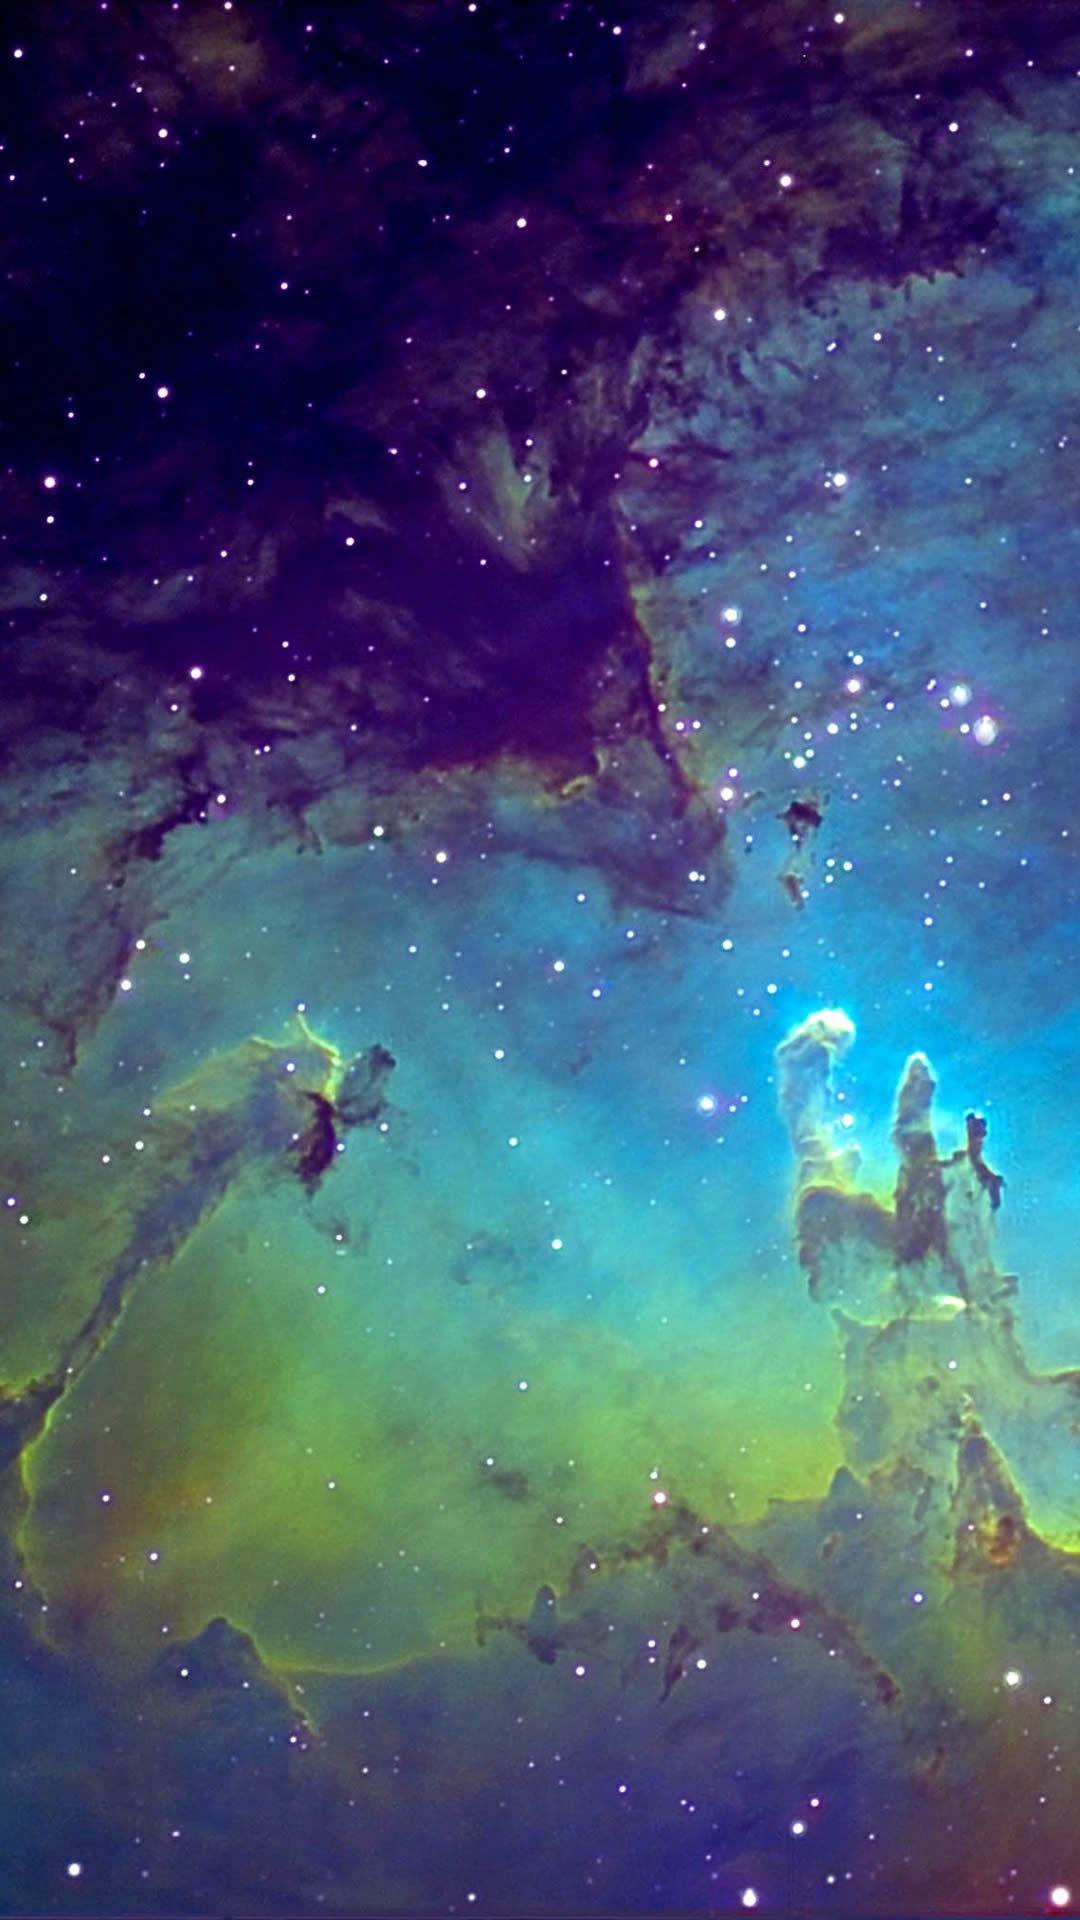 Fantasy Nebula Space iPhone 6 wallpaper Galaxy wallpaper